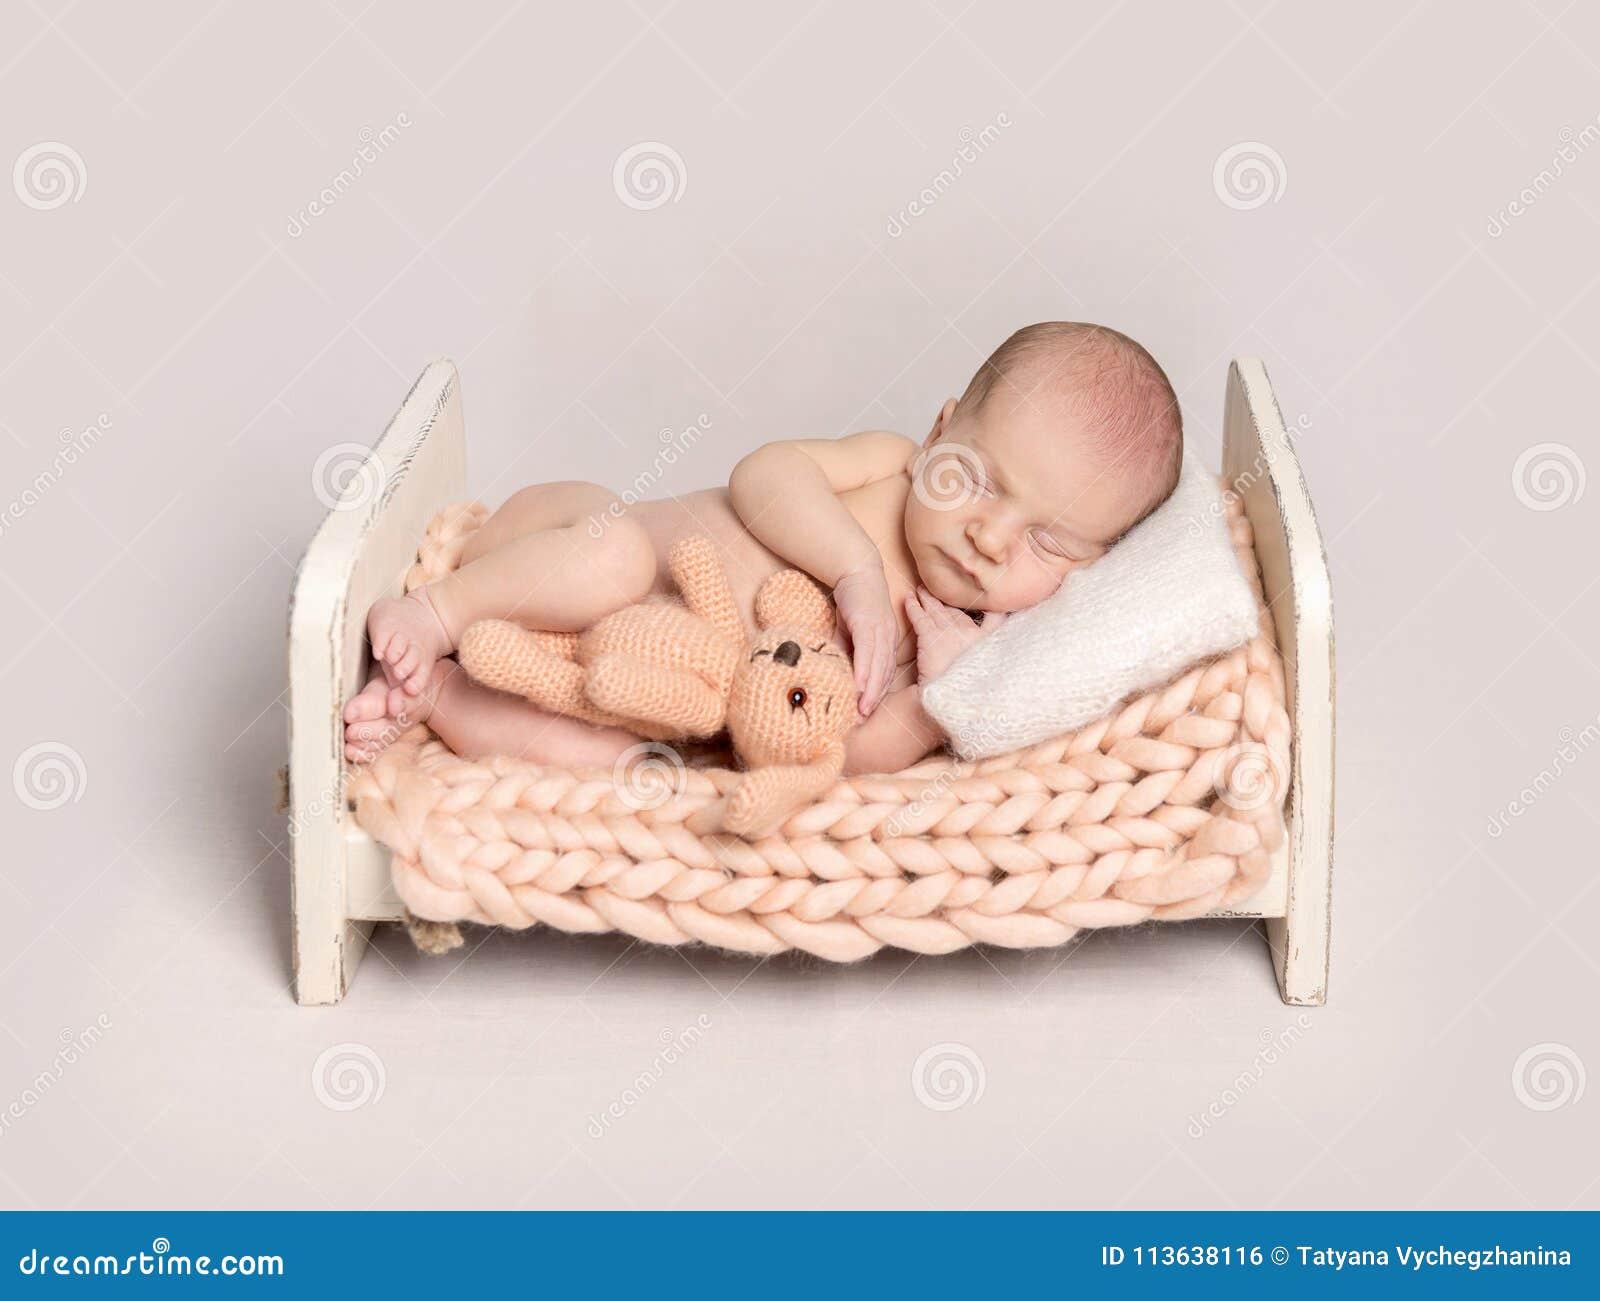 Newborn baby boy sleeping on a small bed